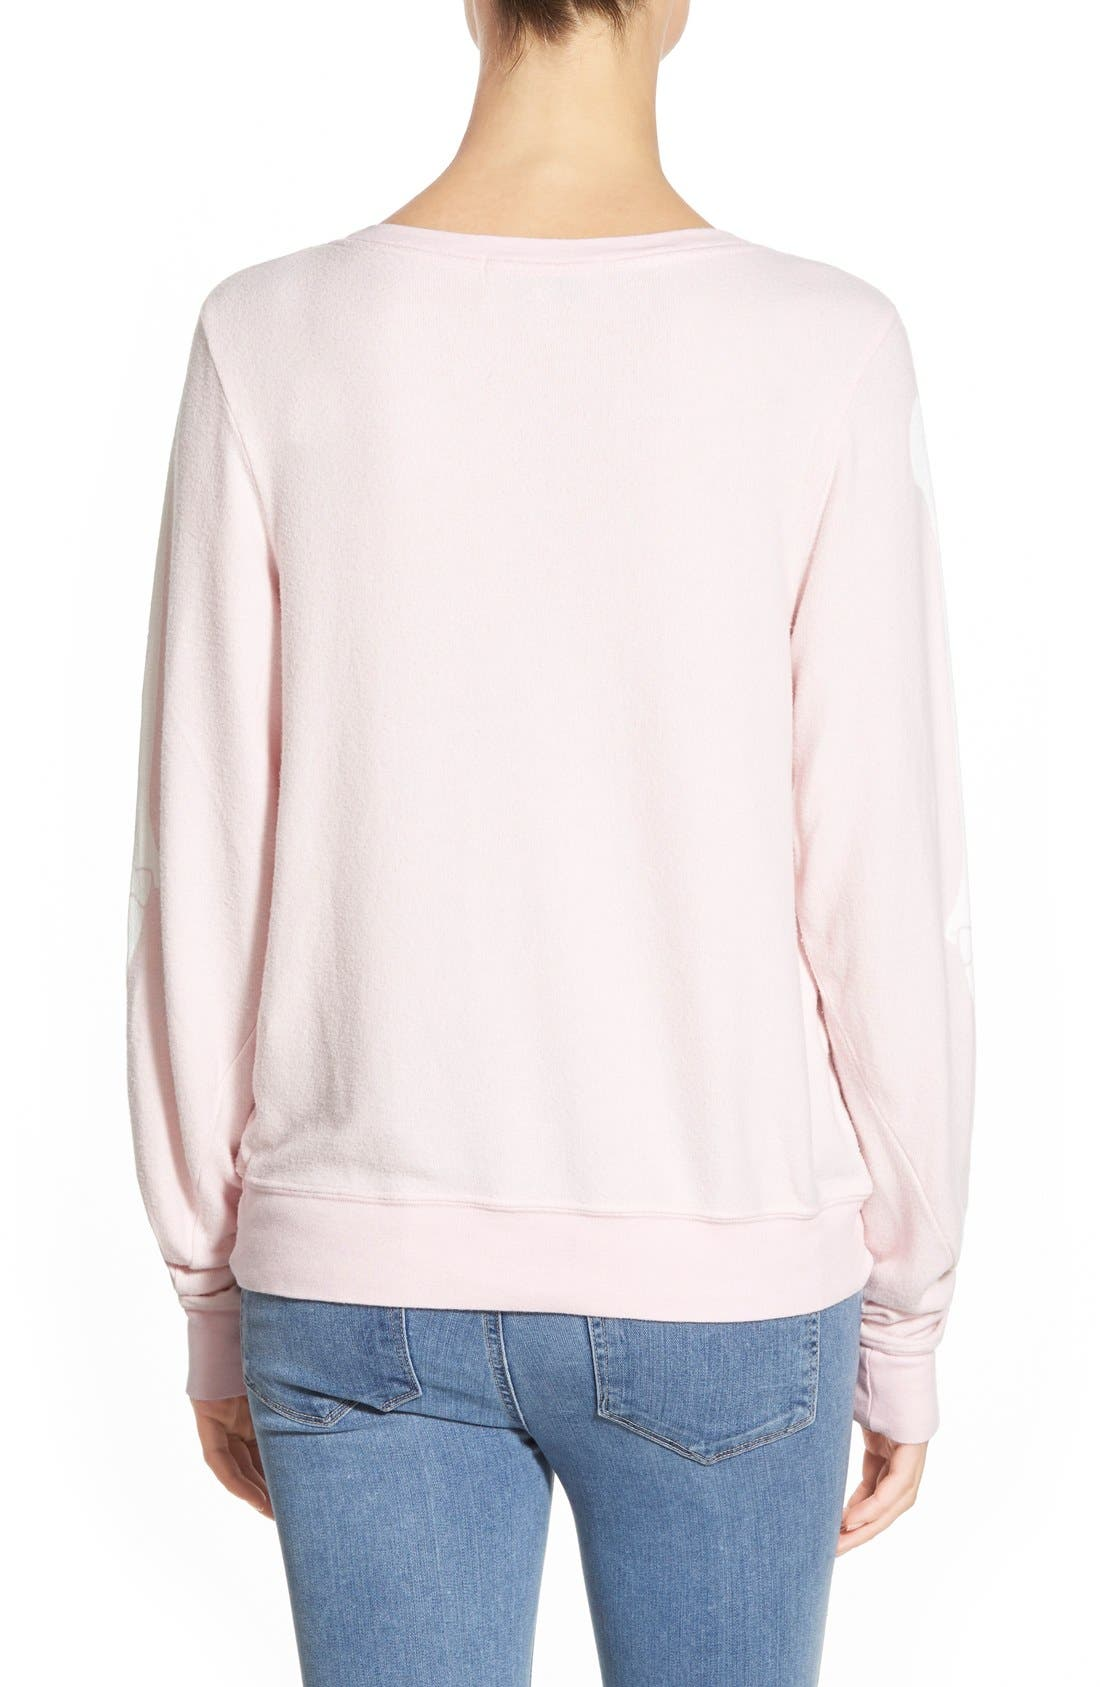 Alternate Image 3  - Wildfox 'Inside Out' Long Sleeve Sweatshirt